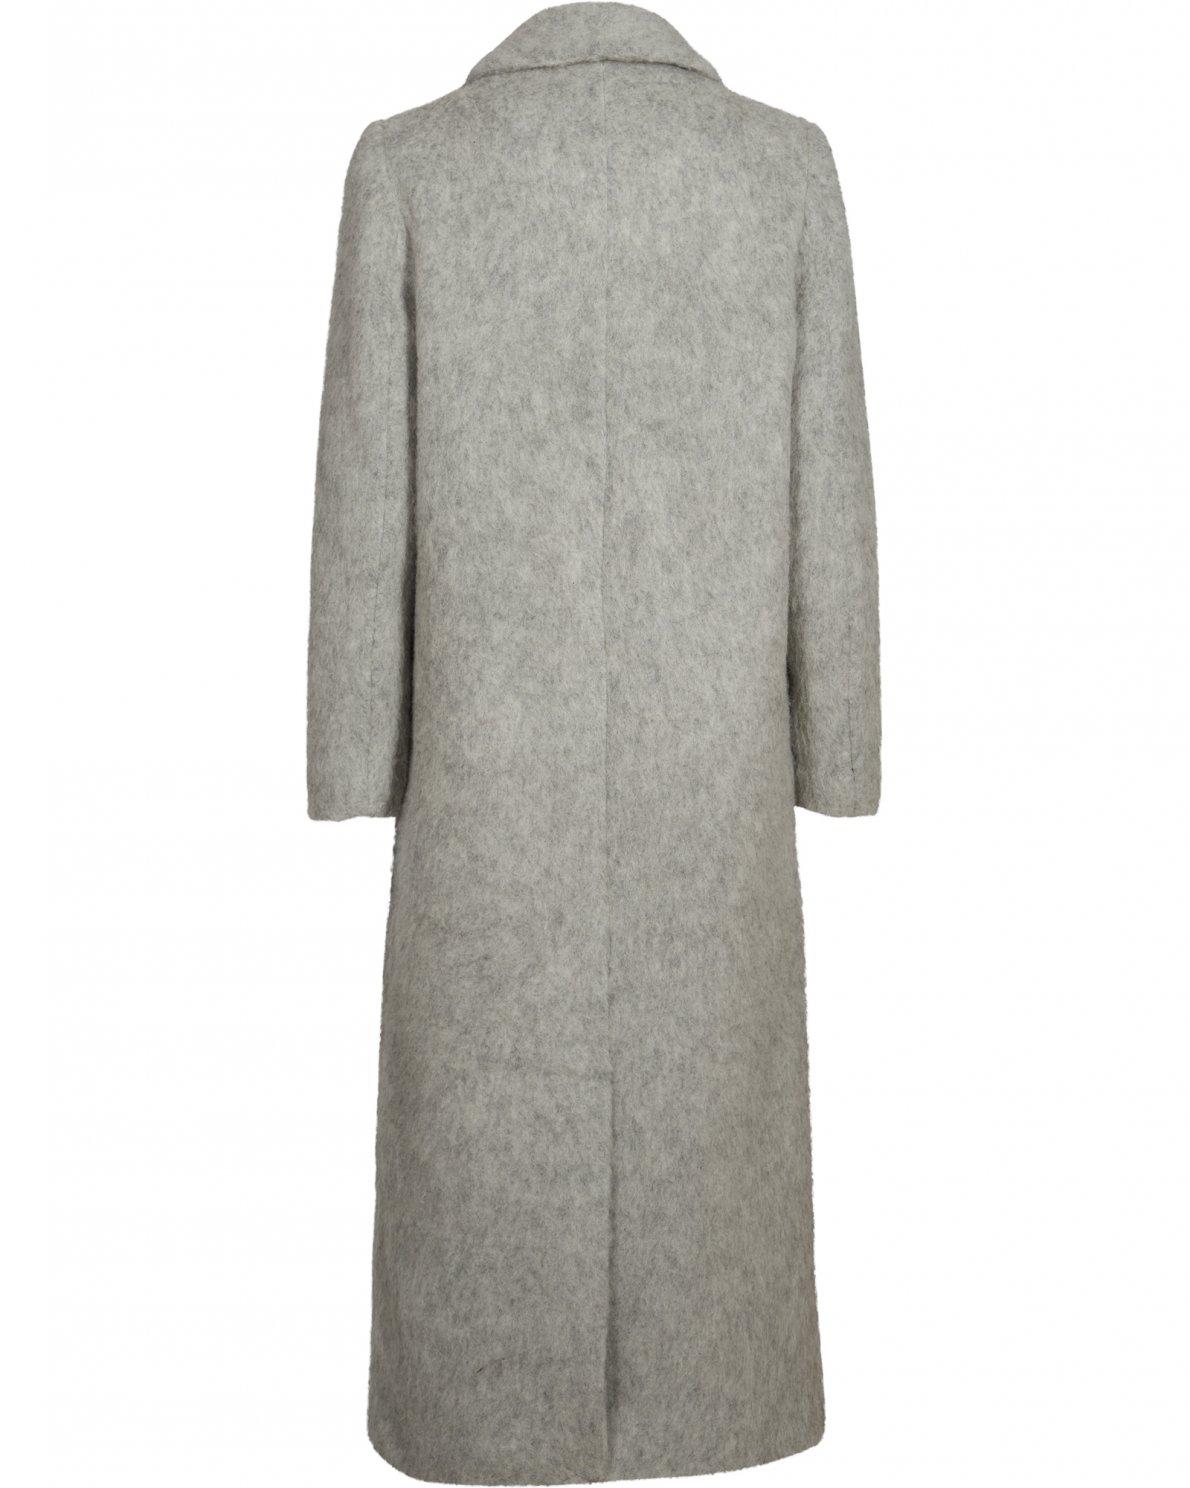 020c85c9ea7 OUTLET Clothing - Moss Copenhagen - Sena Solid Jacket